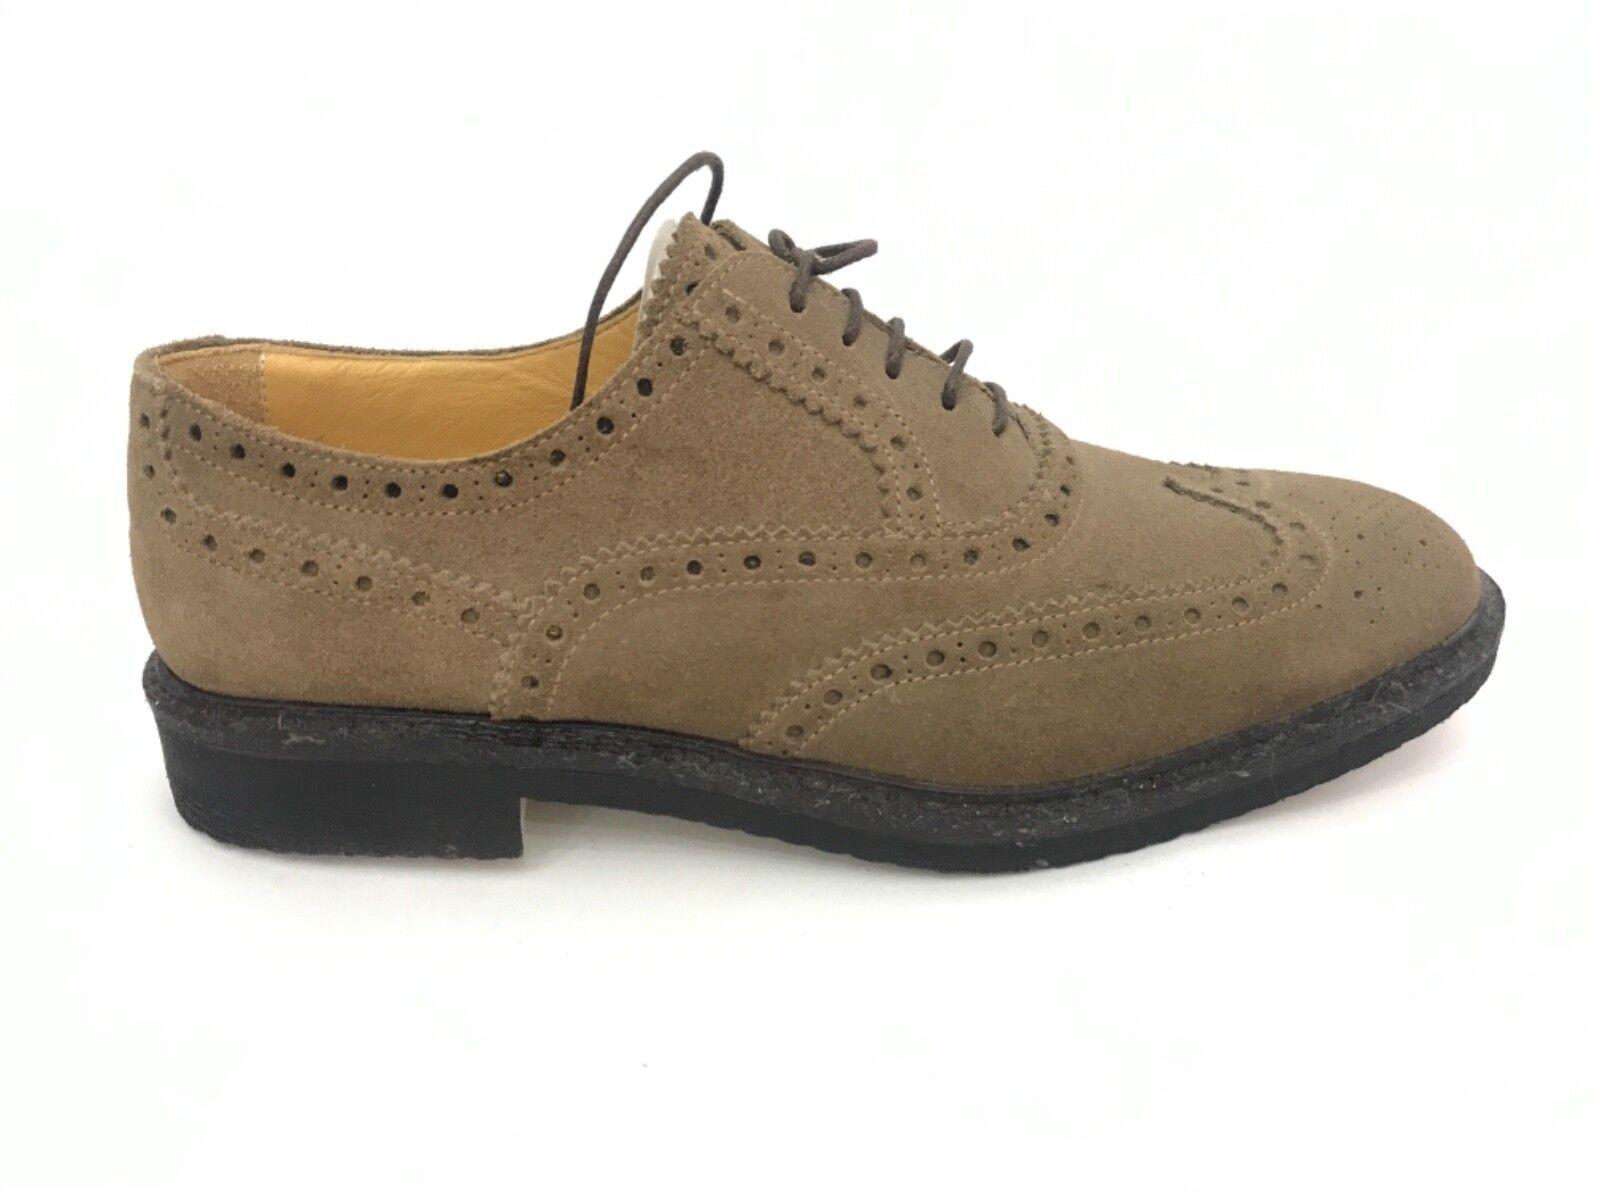 PELUSO shoes shoes man suede brown clear man PELM92